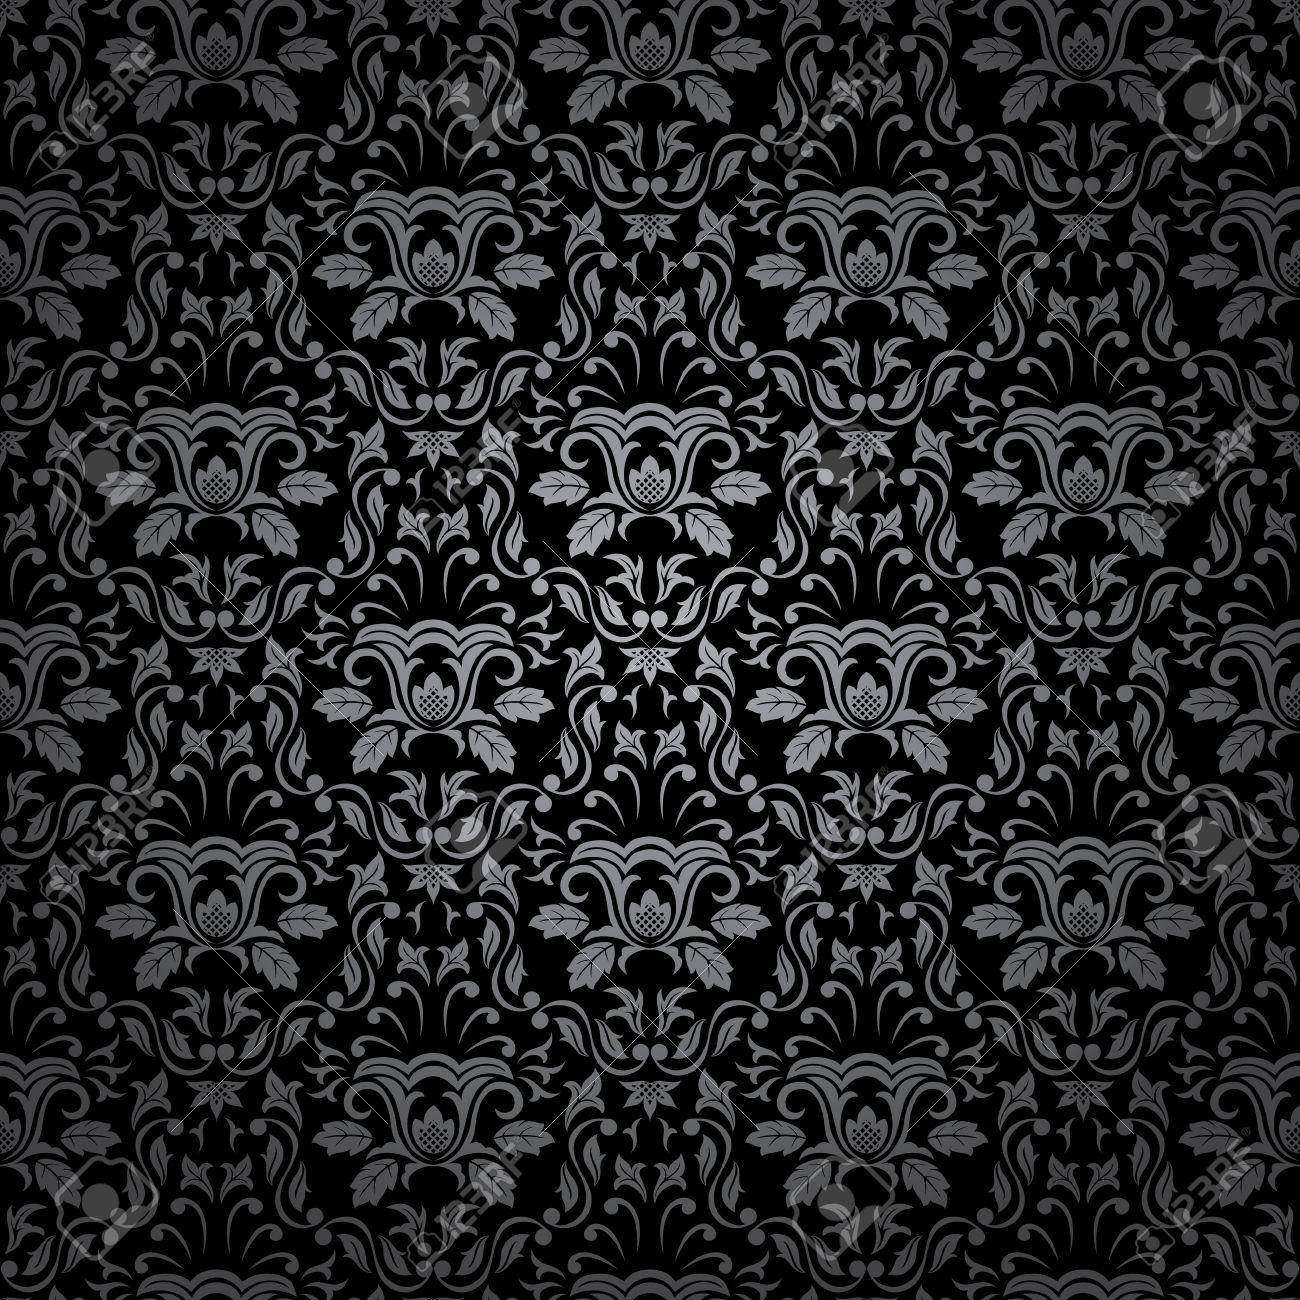 Seamless Gothic Ornamental Wallpaper Floral Pattern Illustration